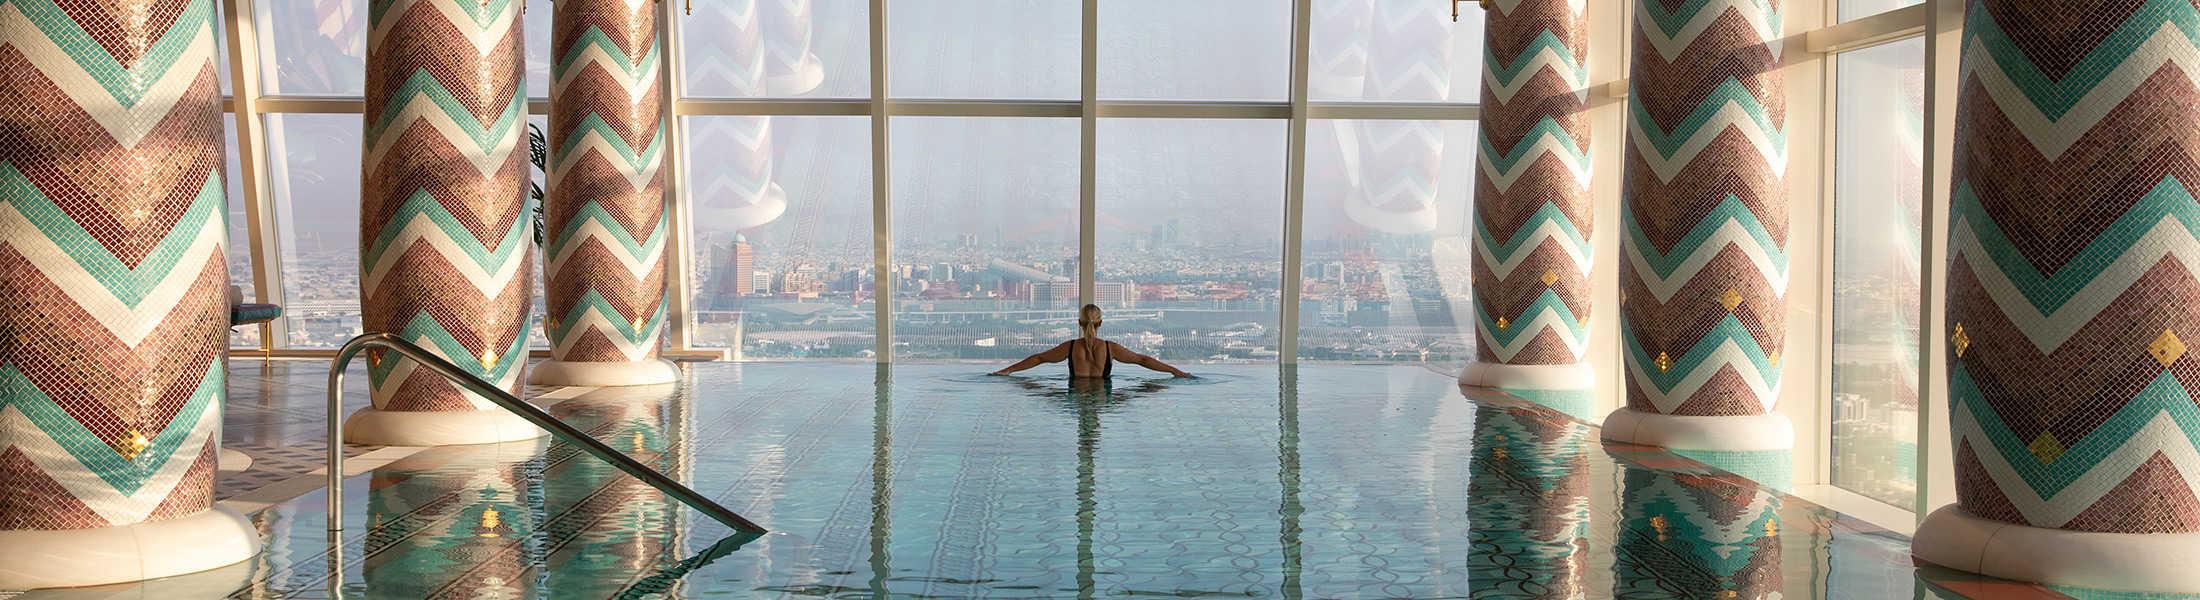 Woman in the spa pool at the Burj Al Arab